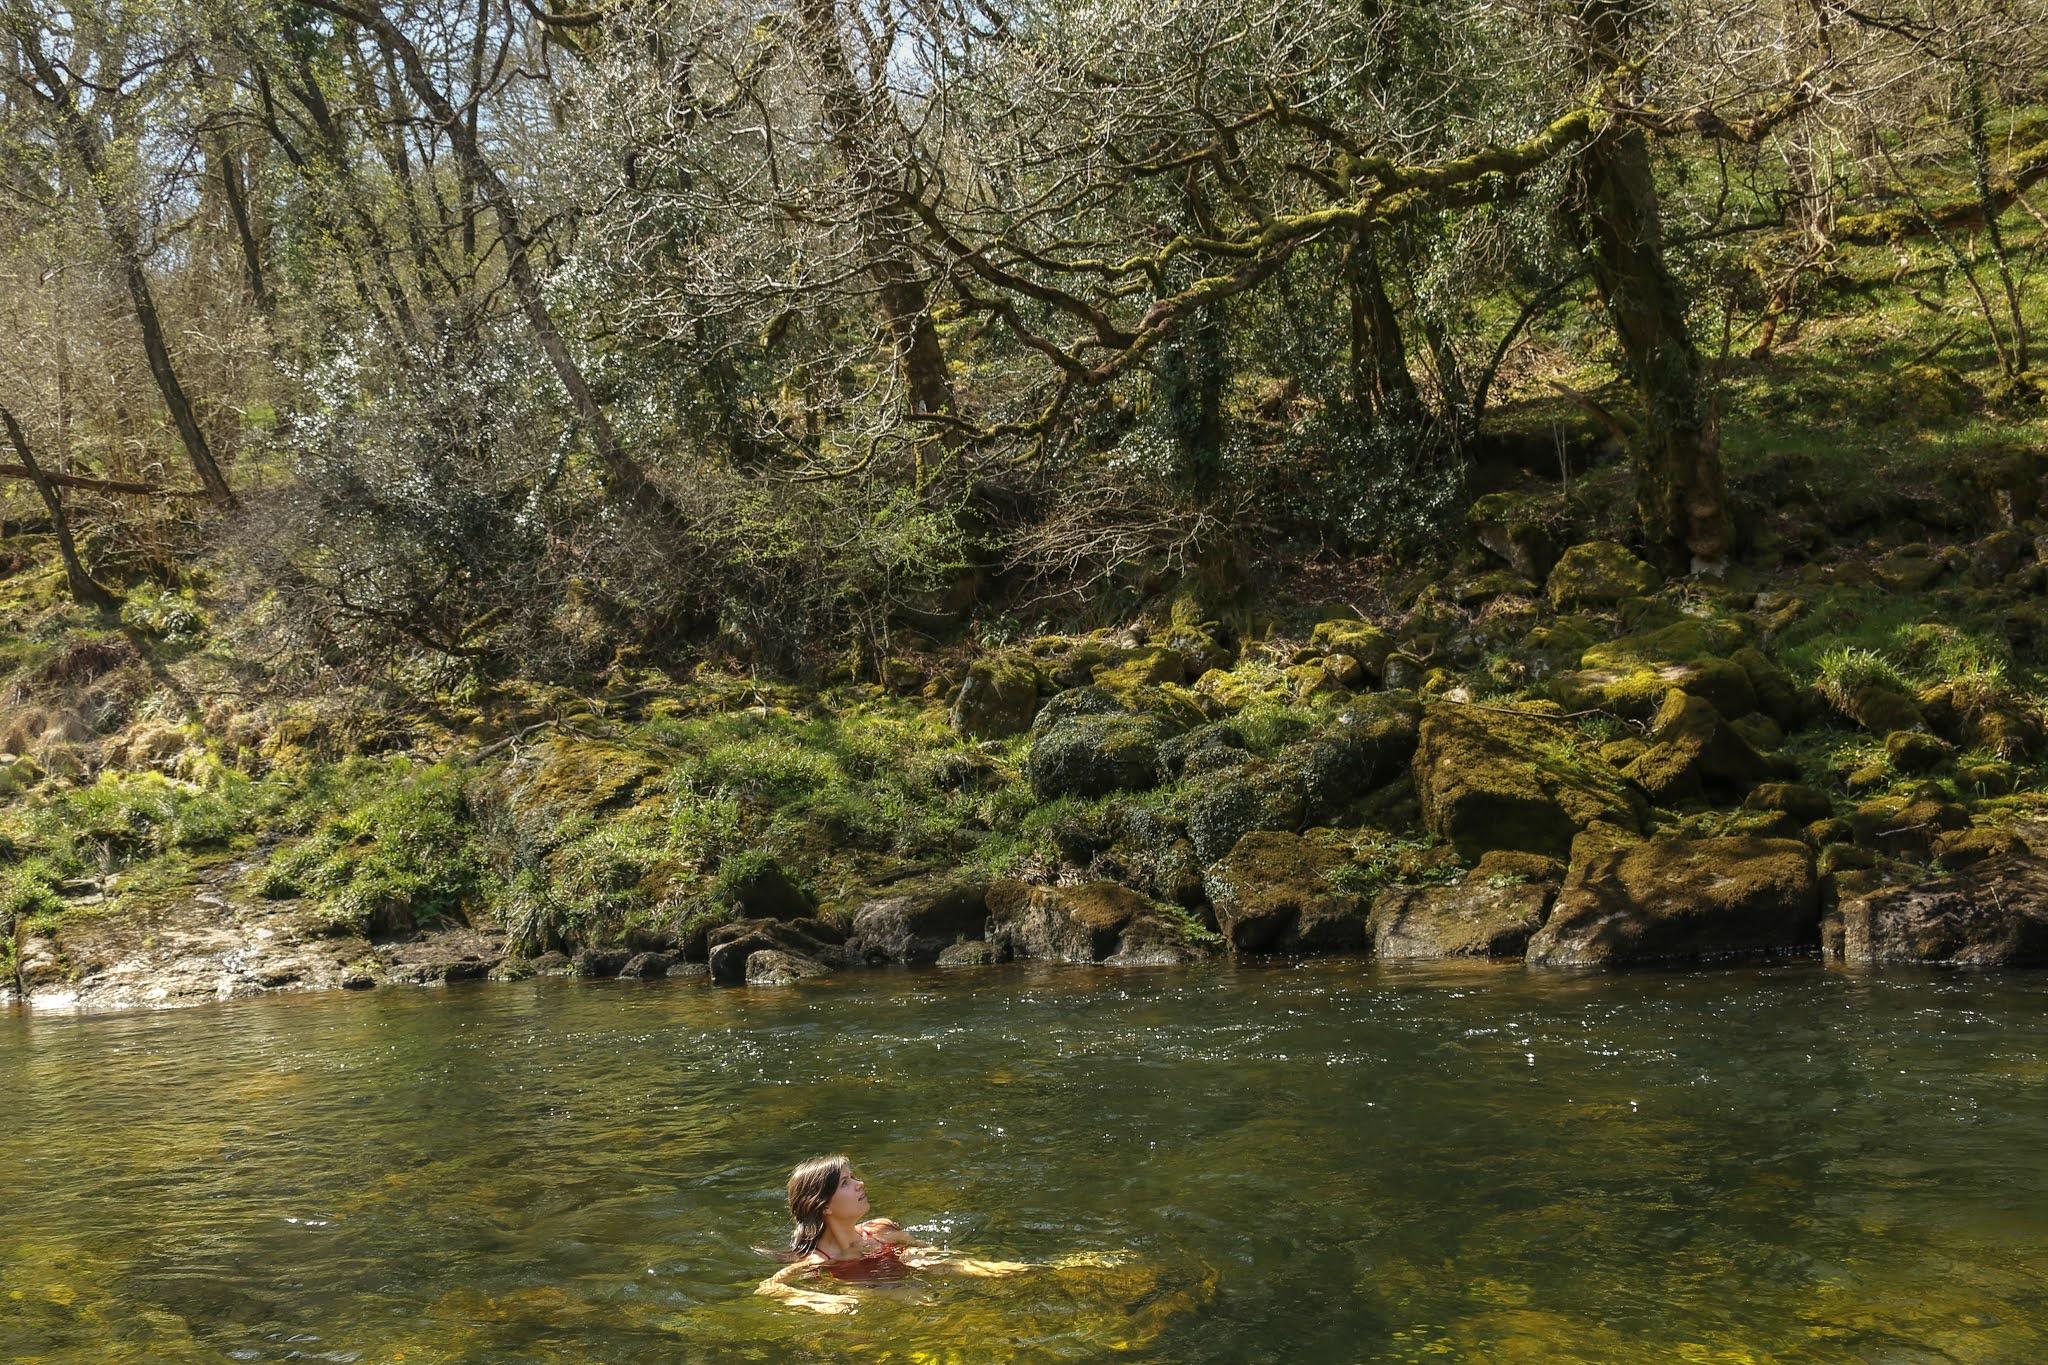 Girl wild swimming in the river Dart in Dartmoor